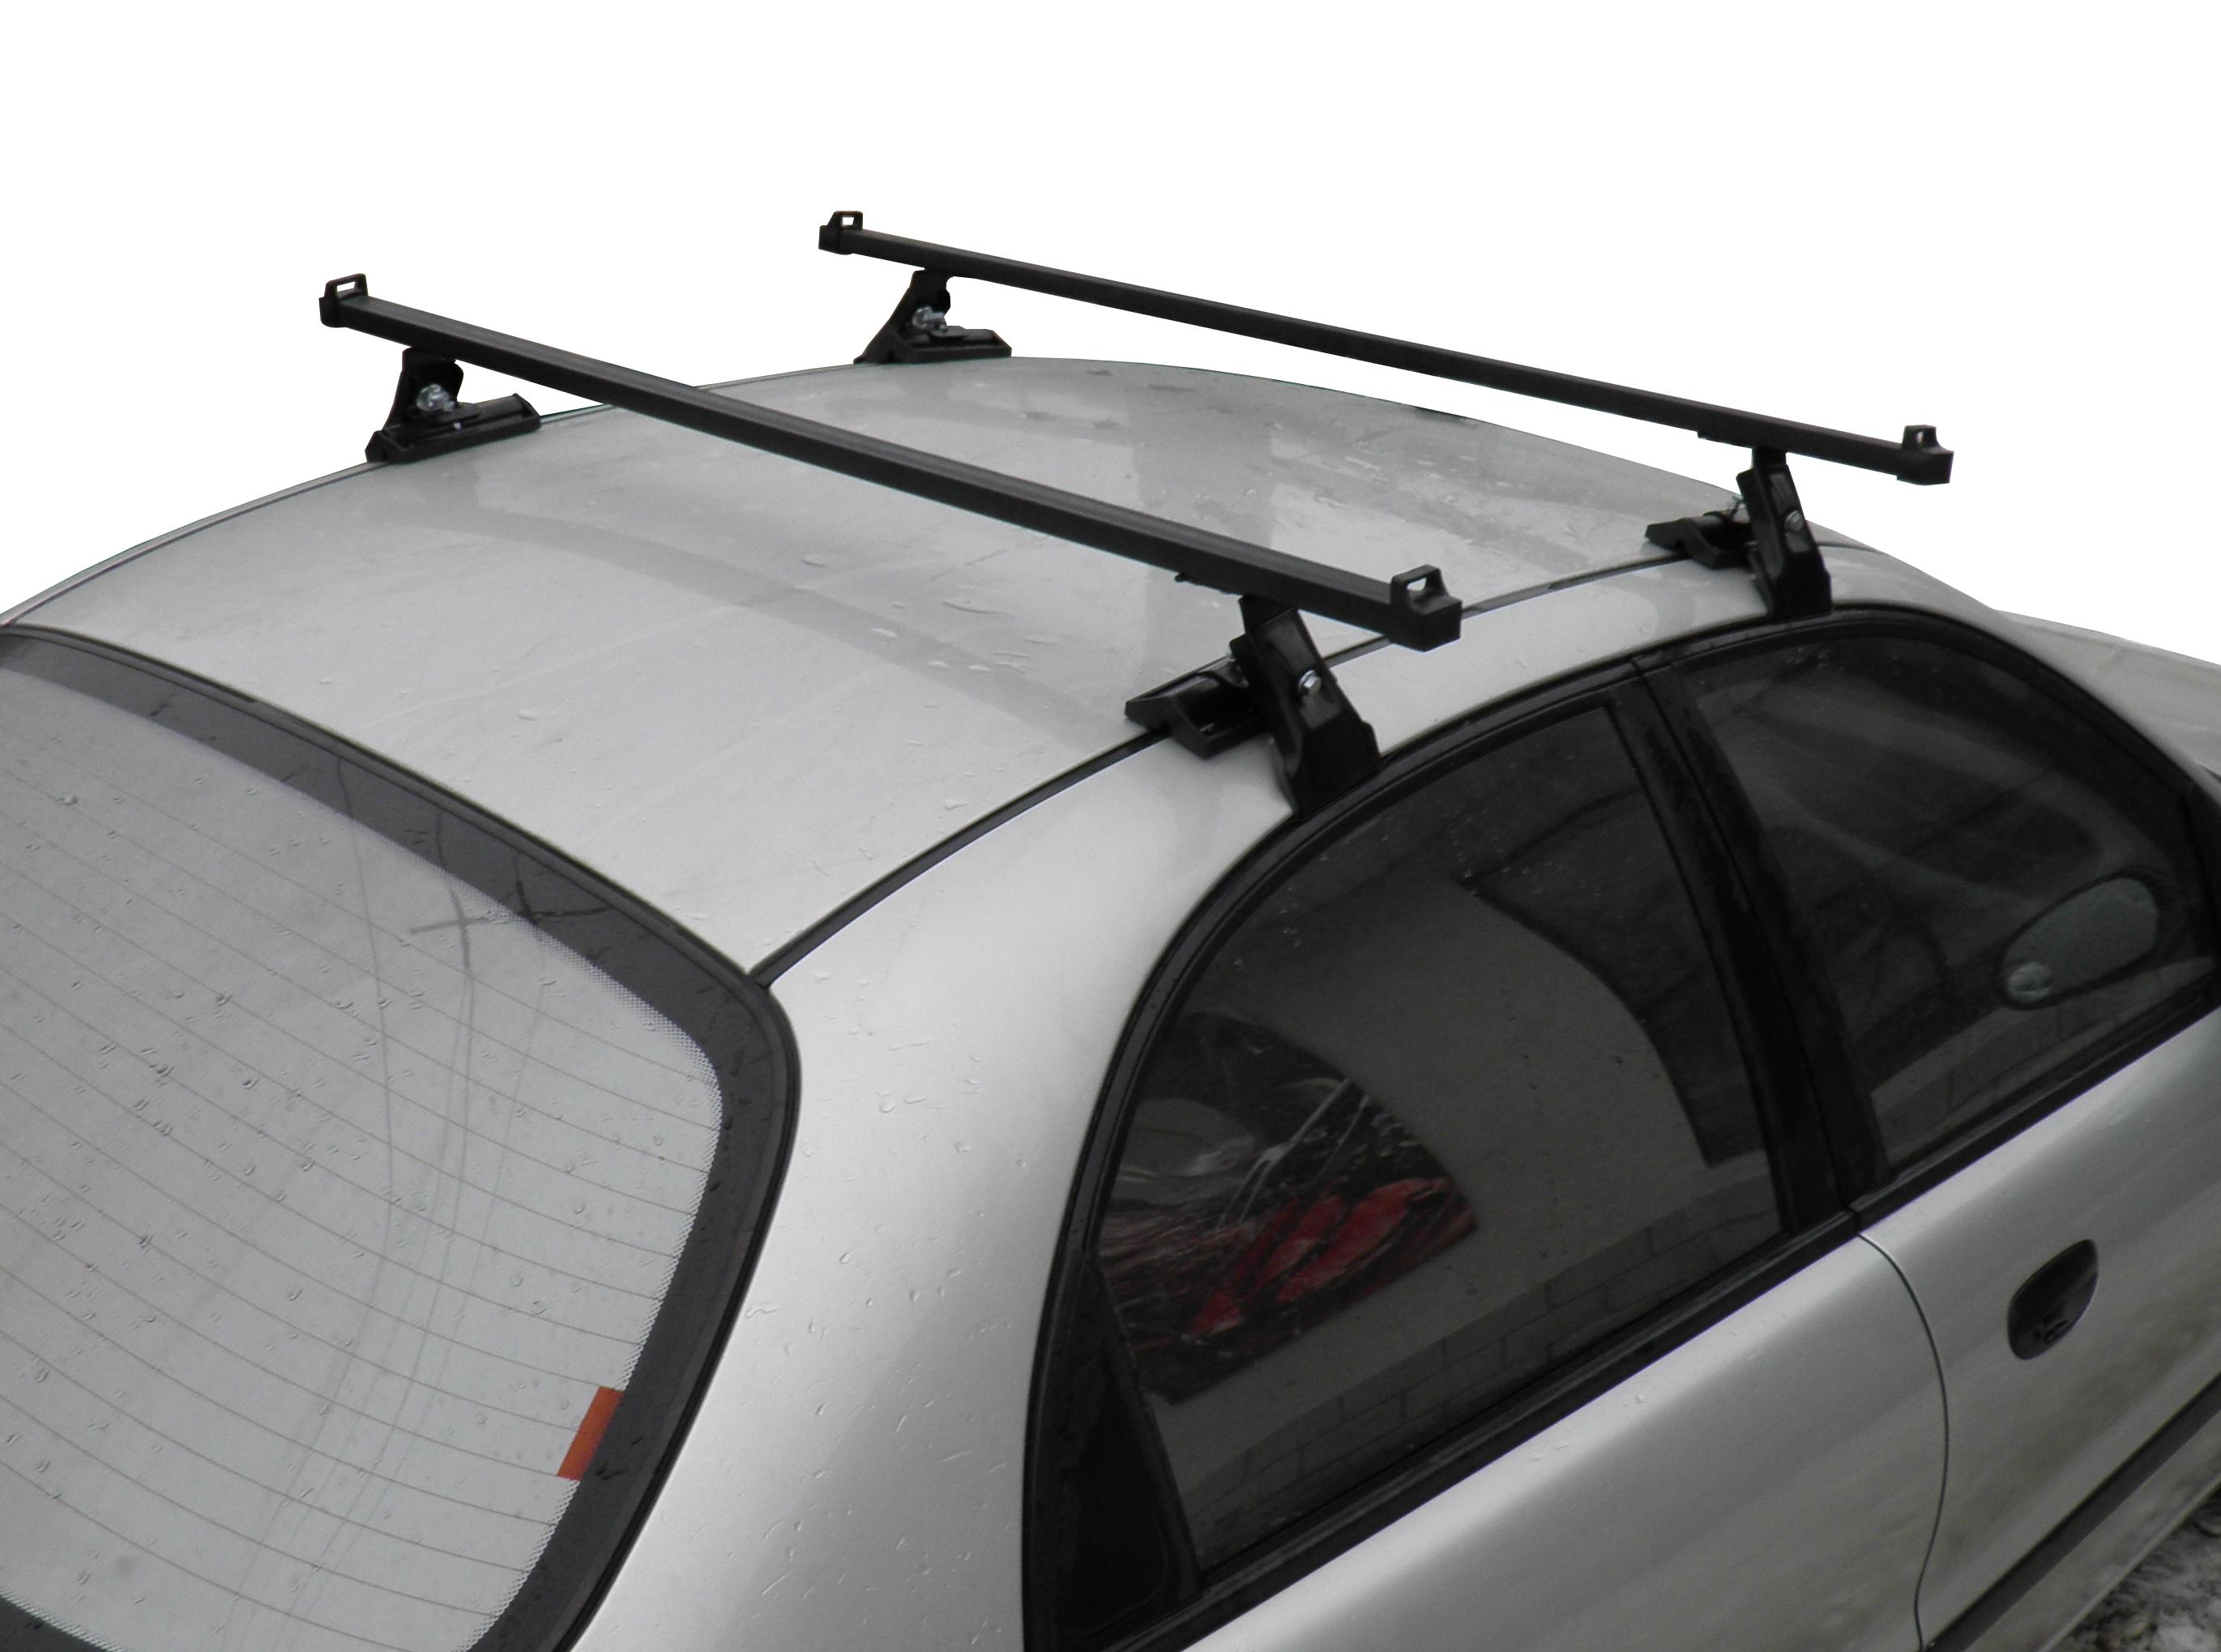 Багажник на гладкую крышу автомобиля